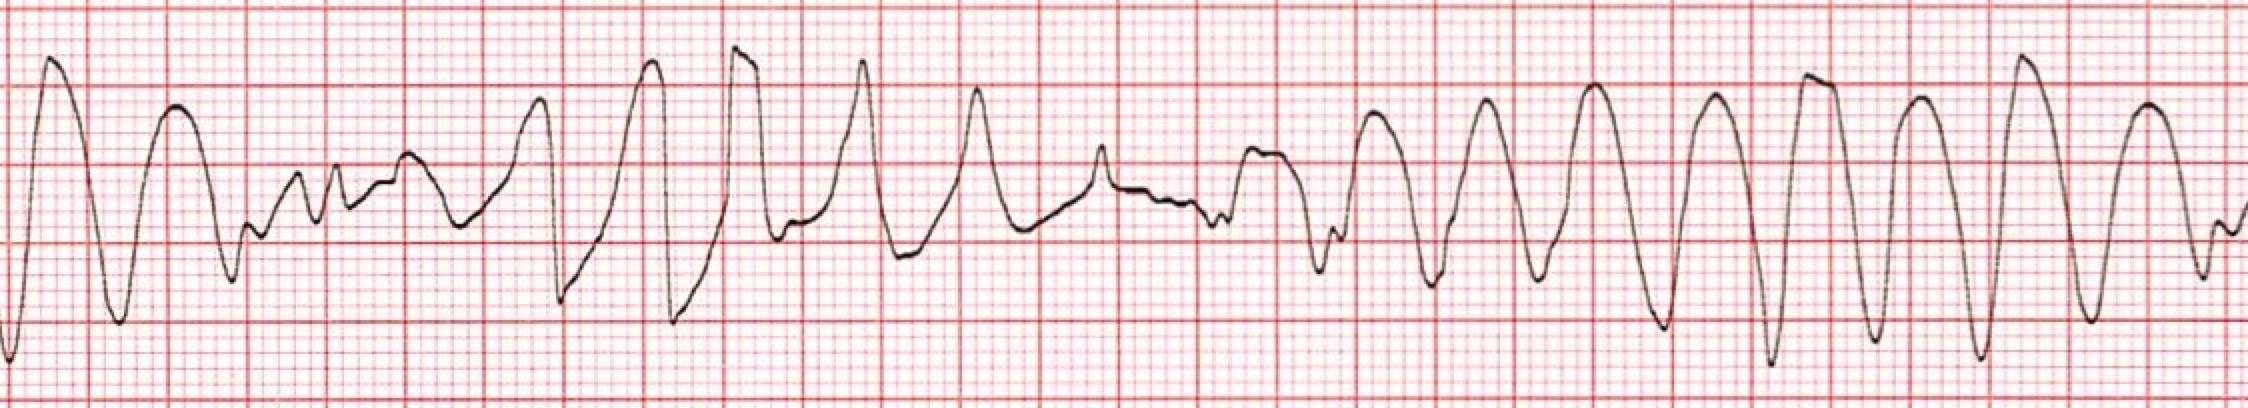 Wide Complex Tachycardia Training Acls Cardiac Rhythms Video Proacls